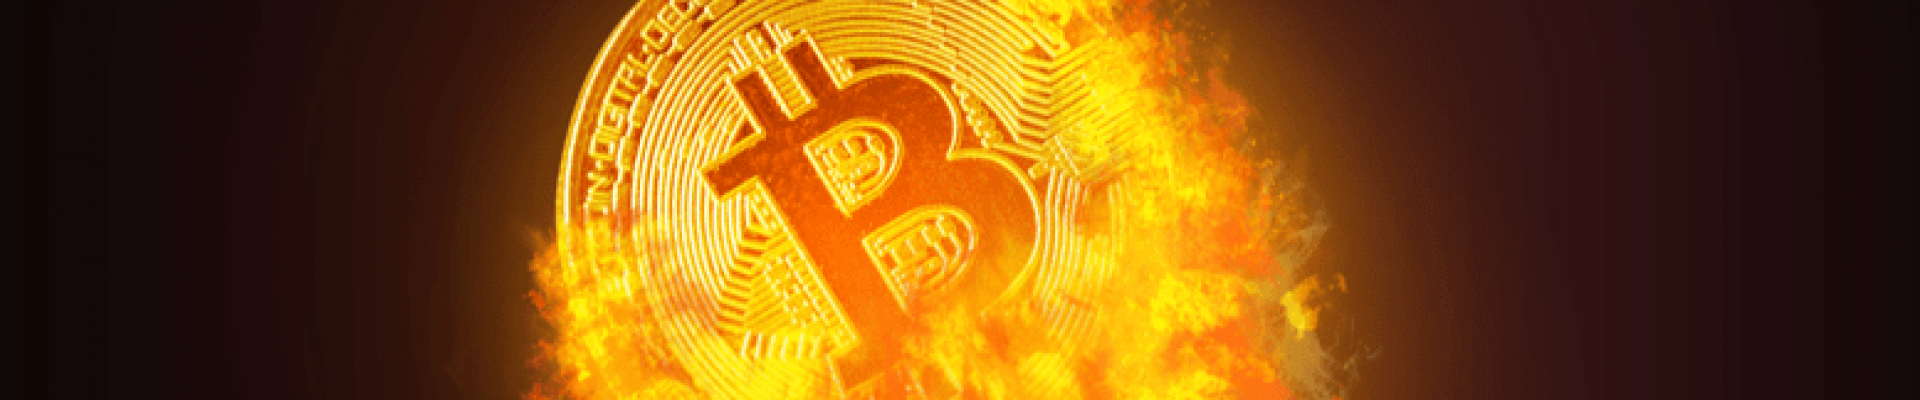 Bitcoin-Price-min-1-3.png